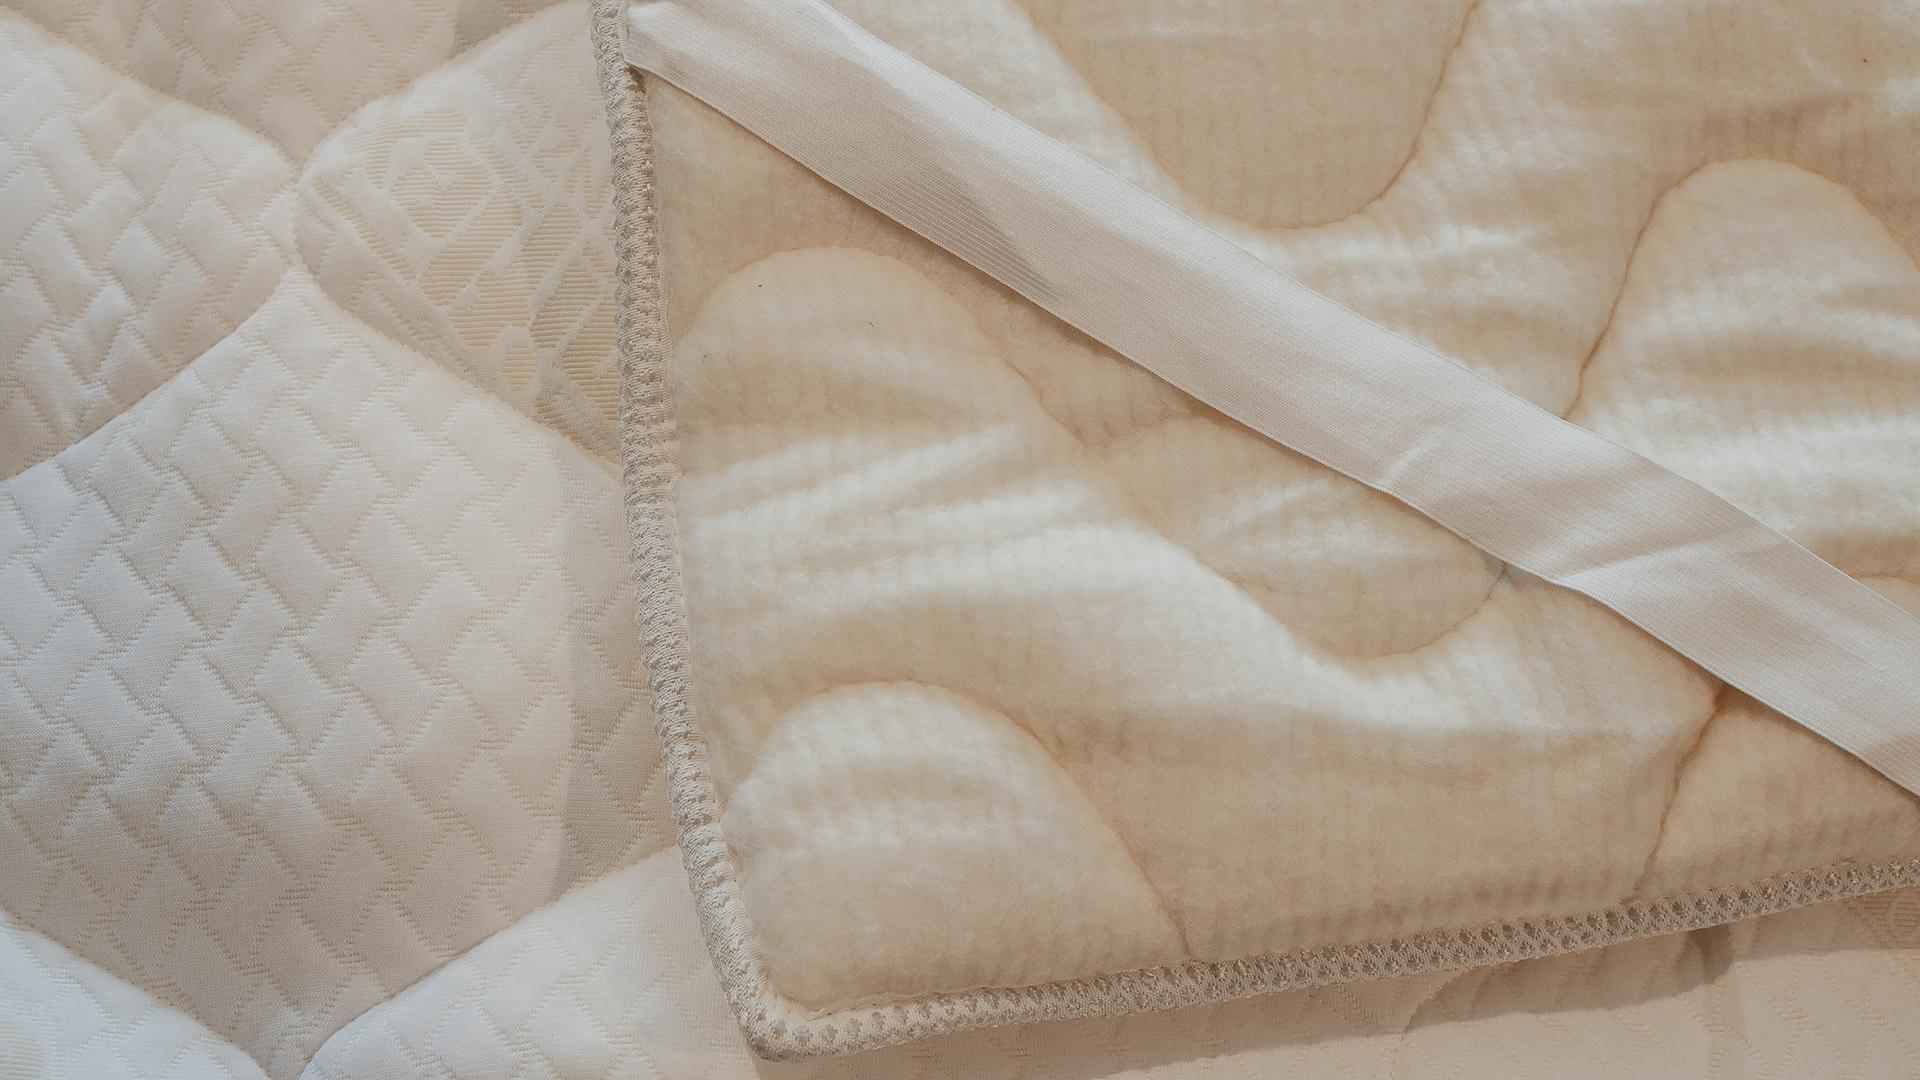 reversible coolmax mattress topper - wool and coolmax